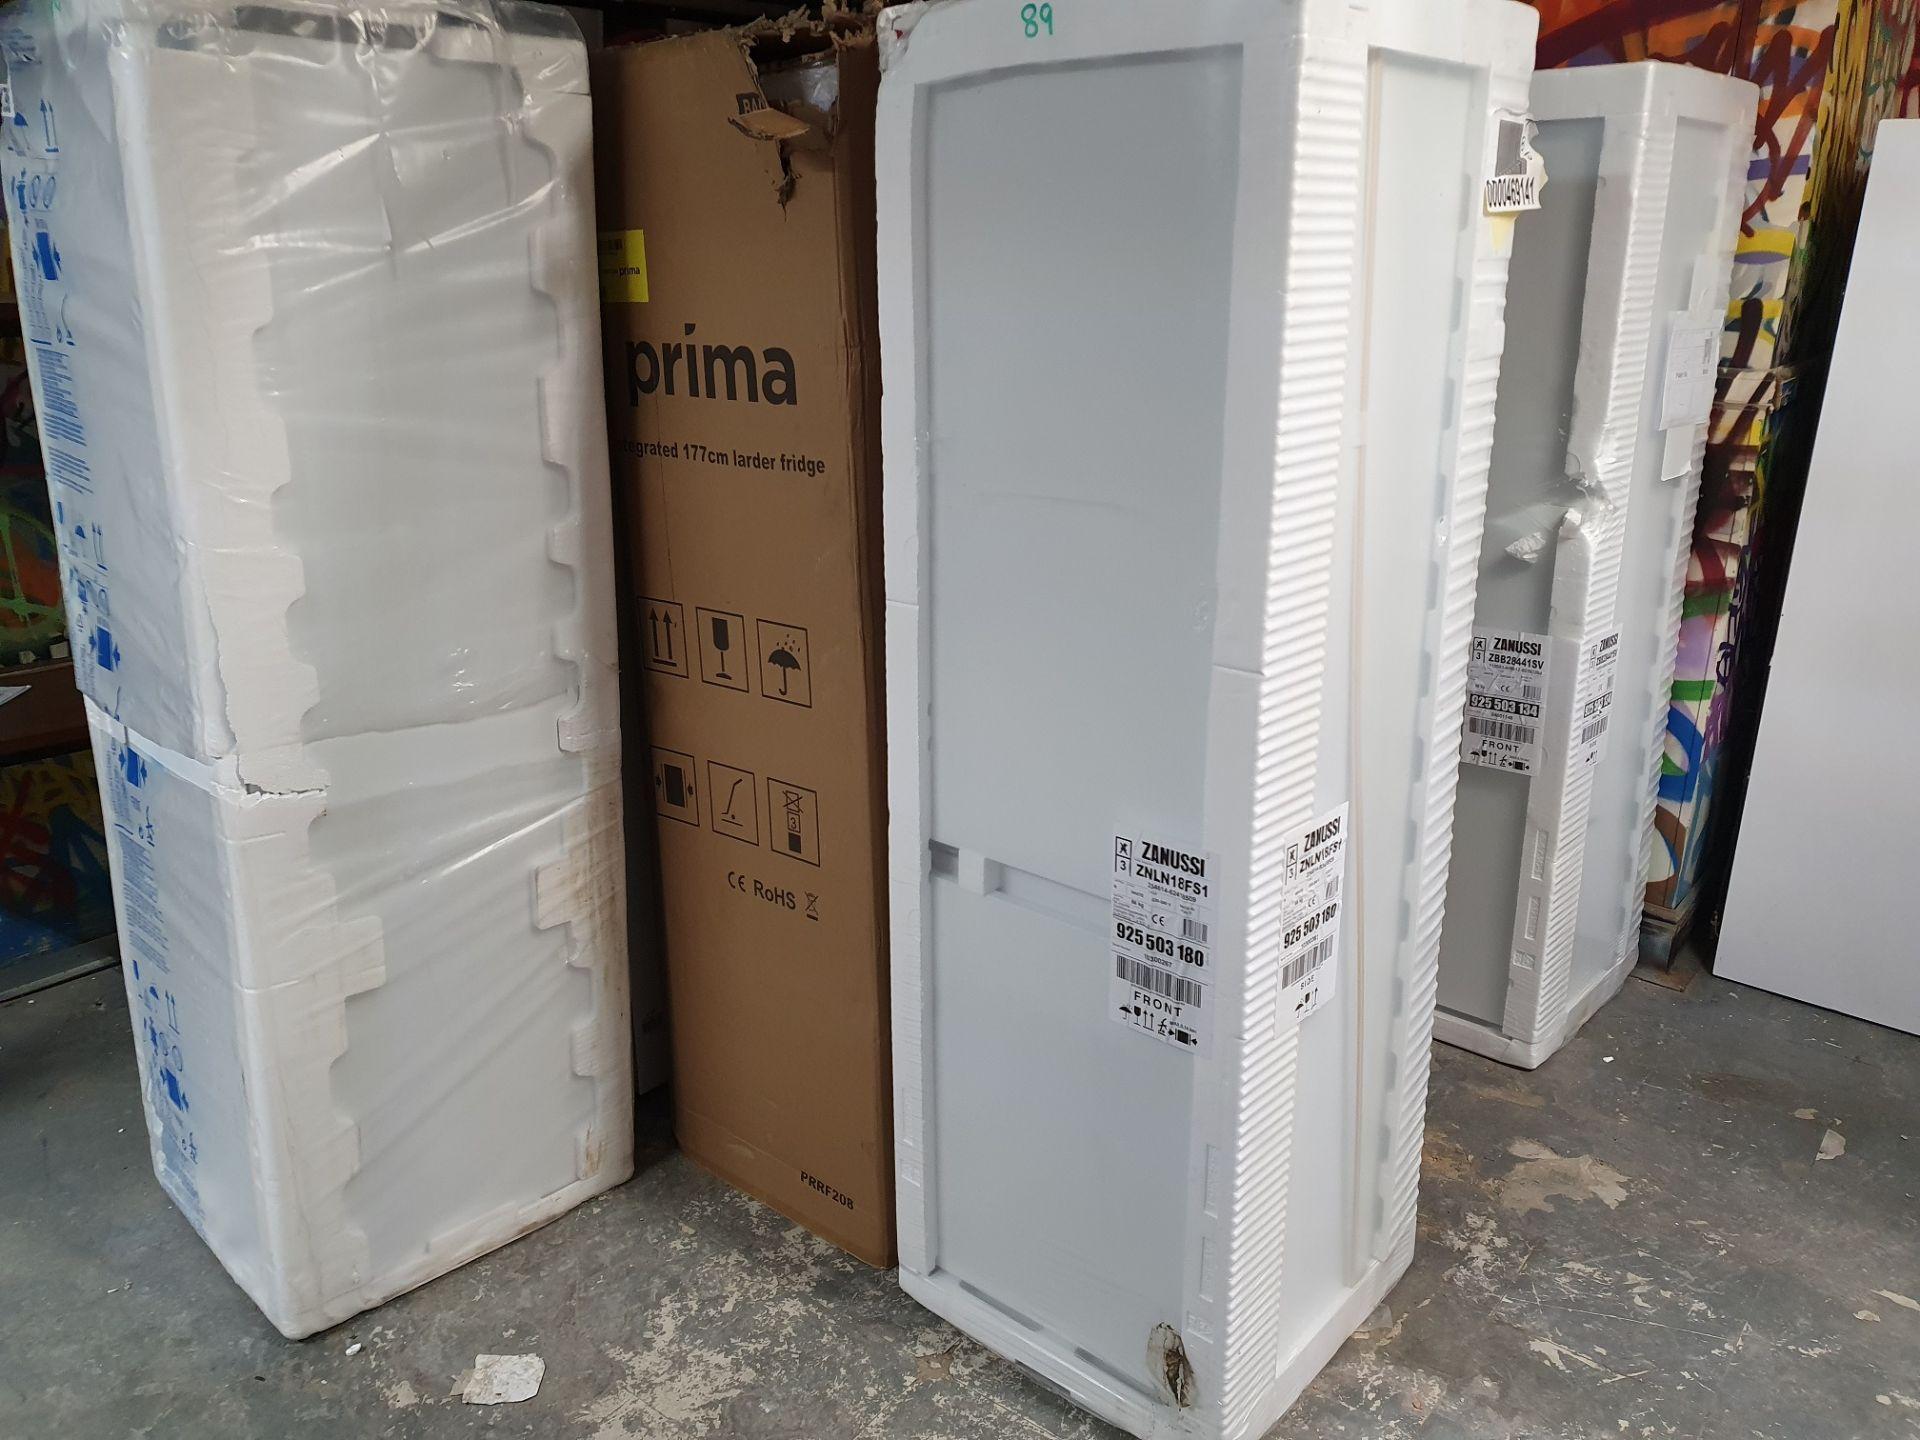 NEW/GRADED AND UNPACKAGED Prima PRRF702 Integrated Fridge Freezer (Brand new slight external - Image 6 of 14